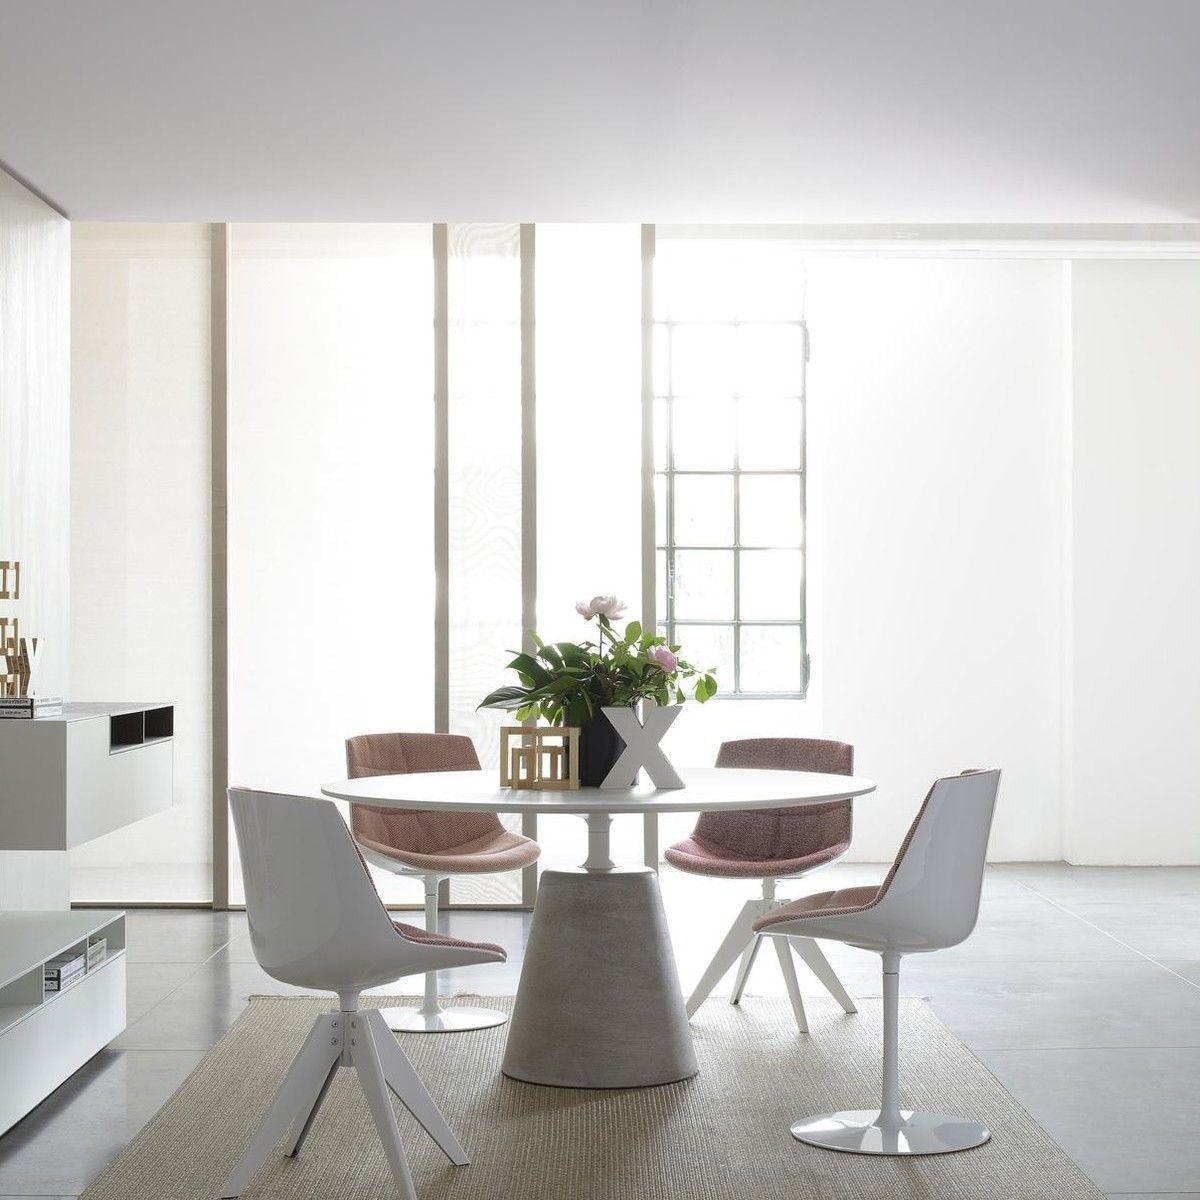 mdf italia rock dining table 120cm mdf italia. Black Bedroom Furniture Sets. Home Design Ideas